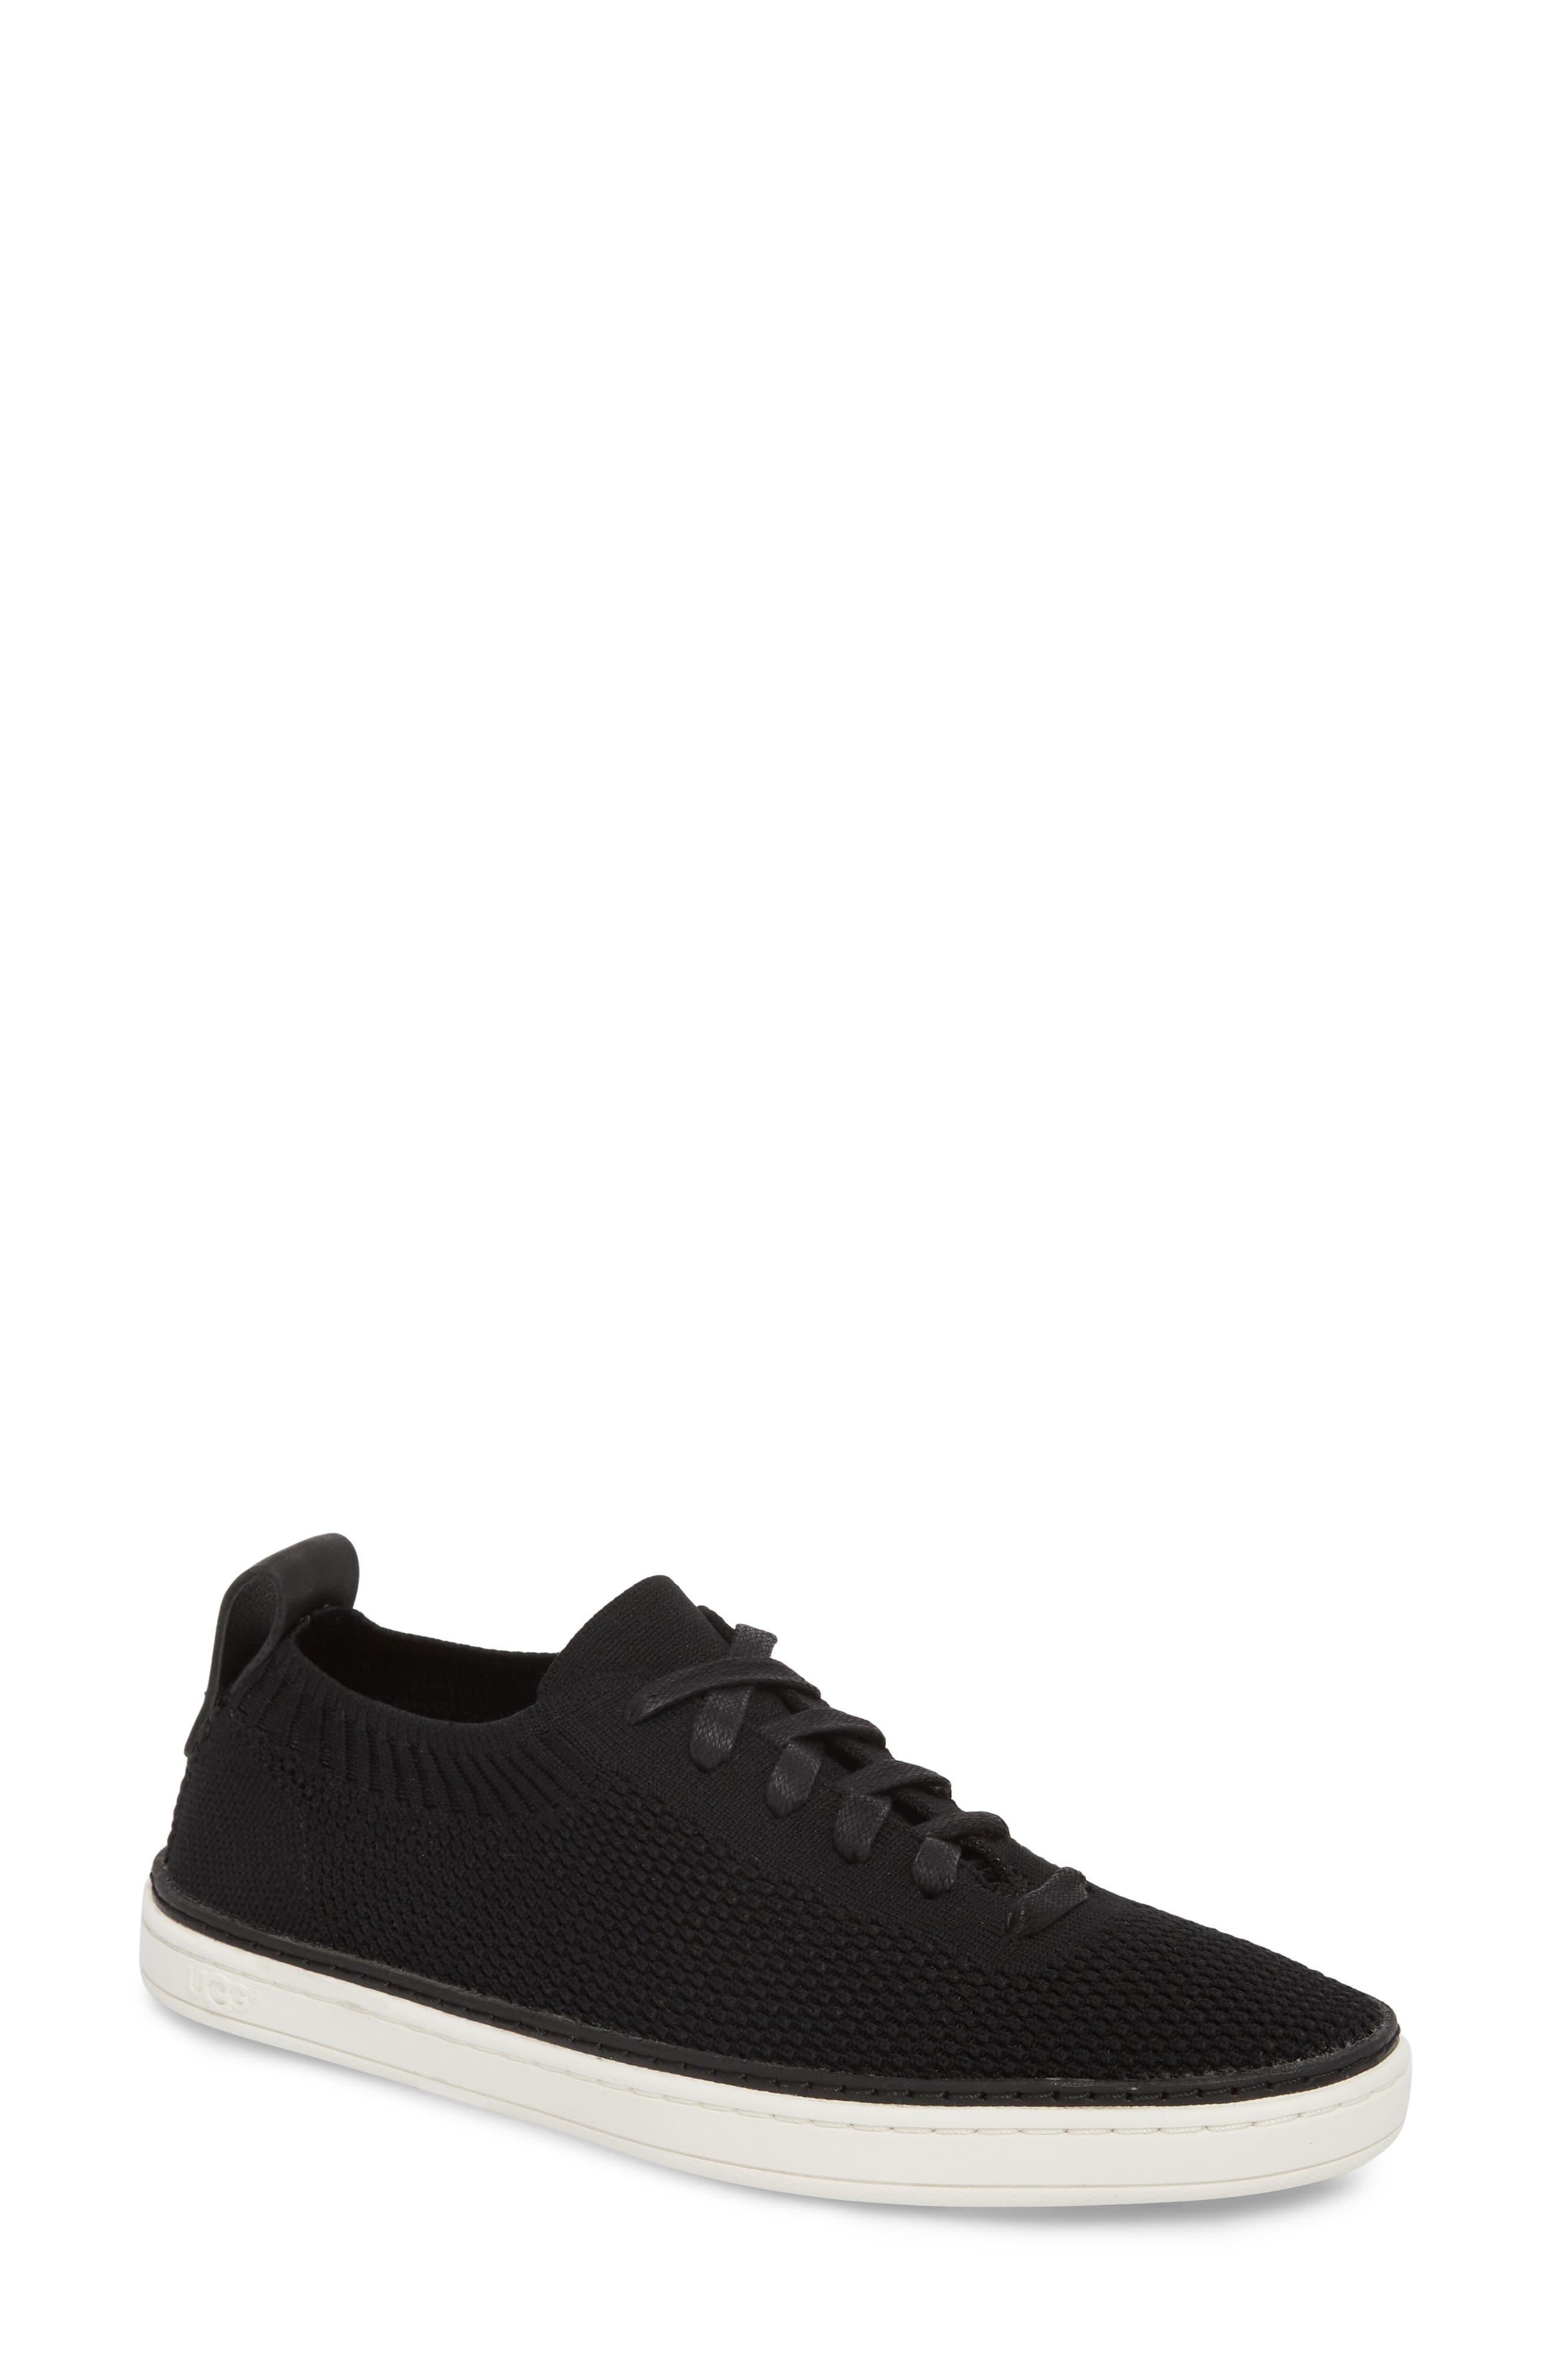 UGG<SUP>®</SUP>, Sidney Sneaker, Main thumbnail 1, color, BLACK FABRIC